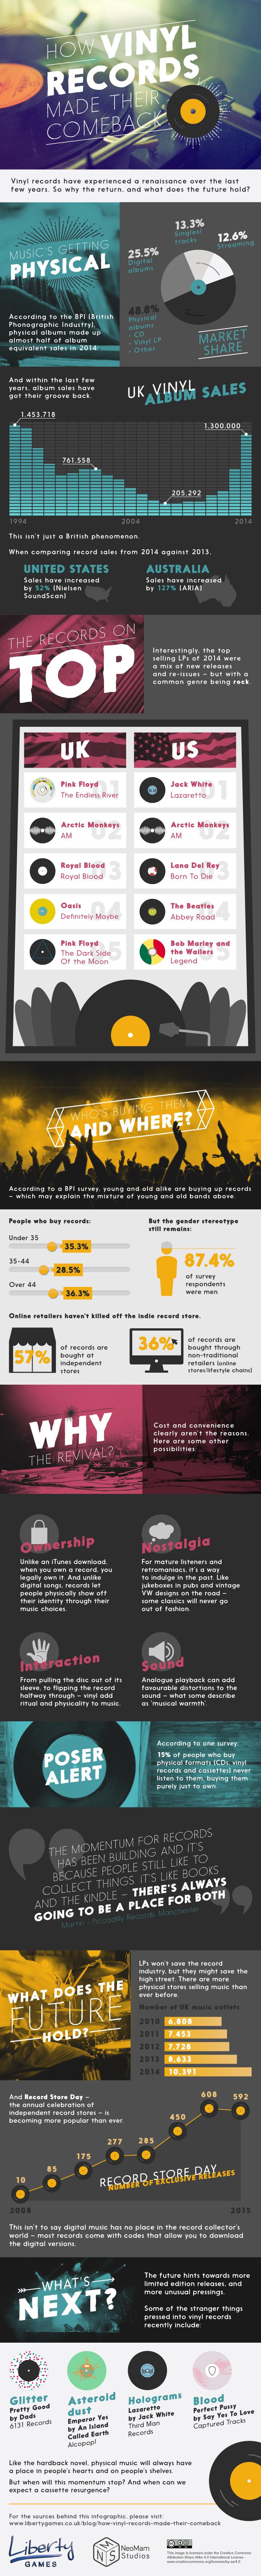 infografia vinilos 2014